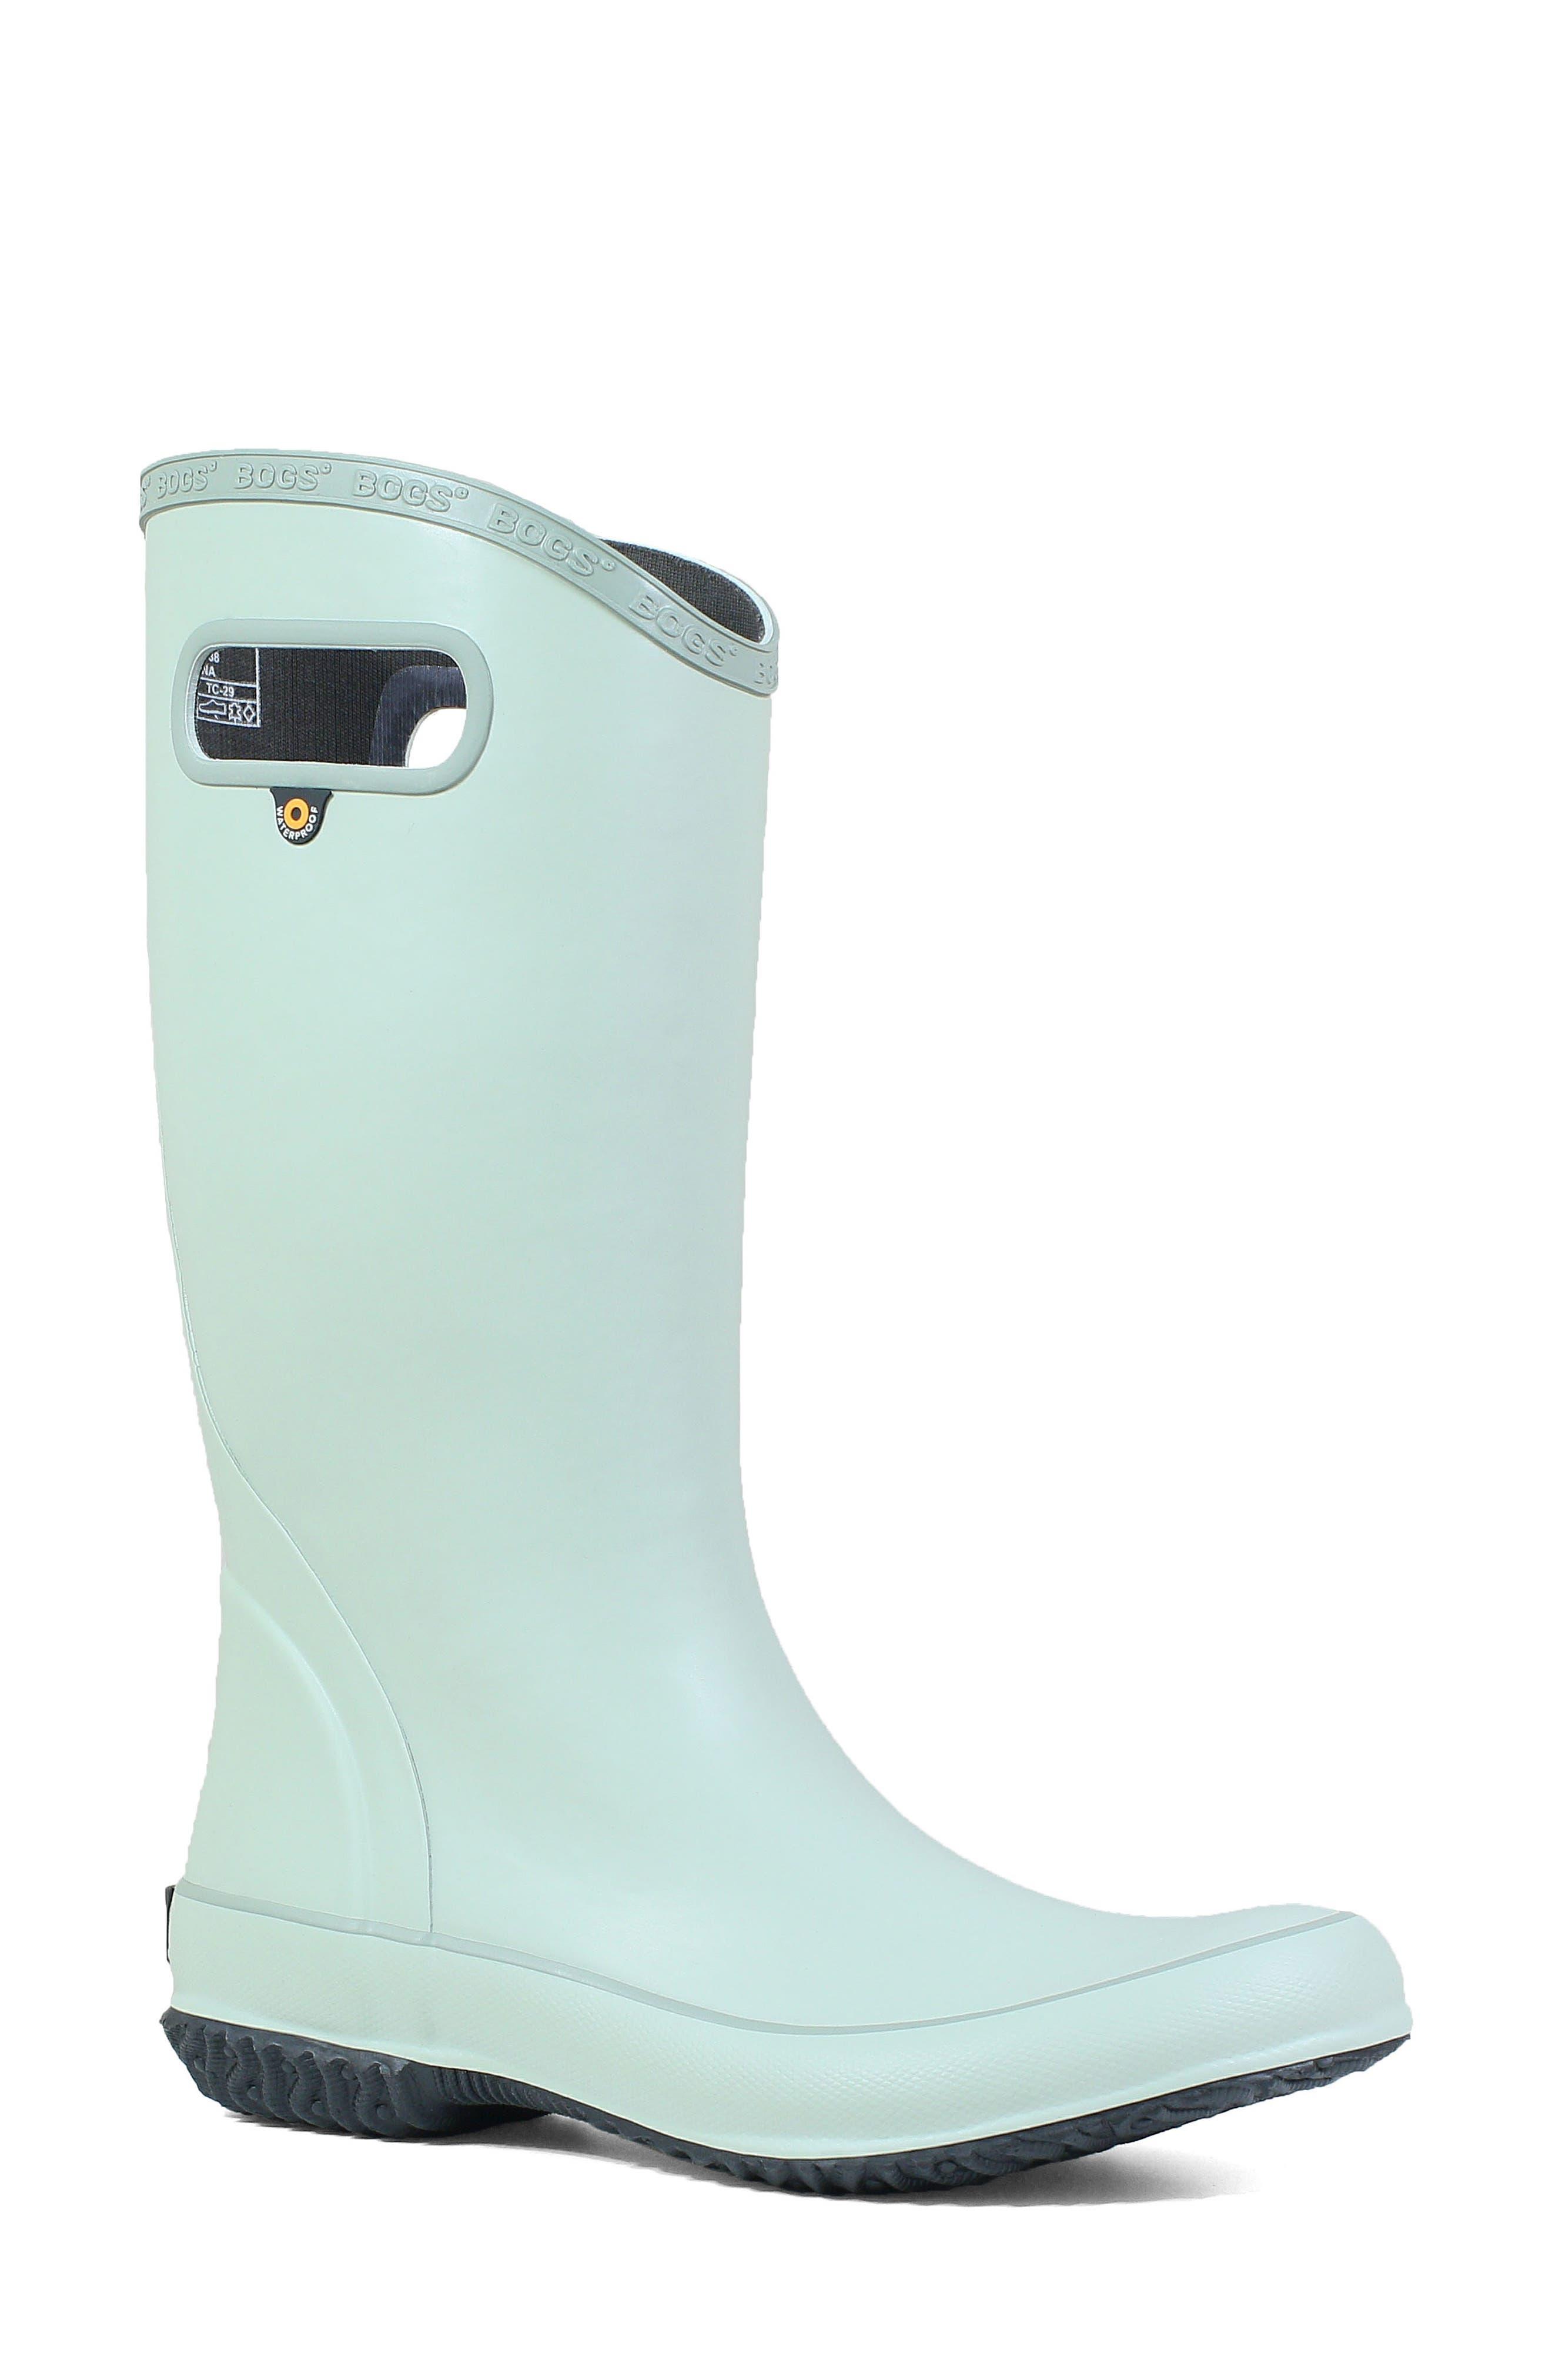 Bogs Classic Tall Waterproof Rain Boot, Green